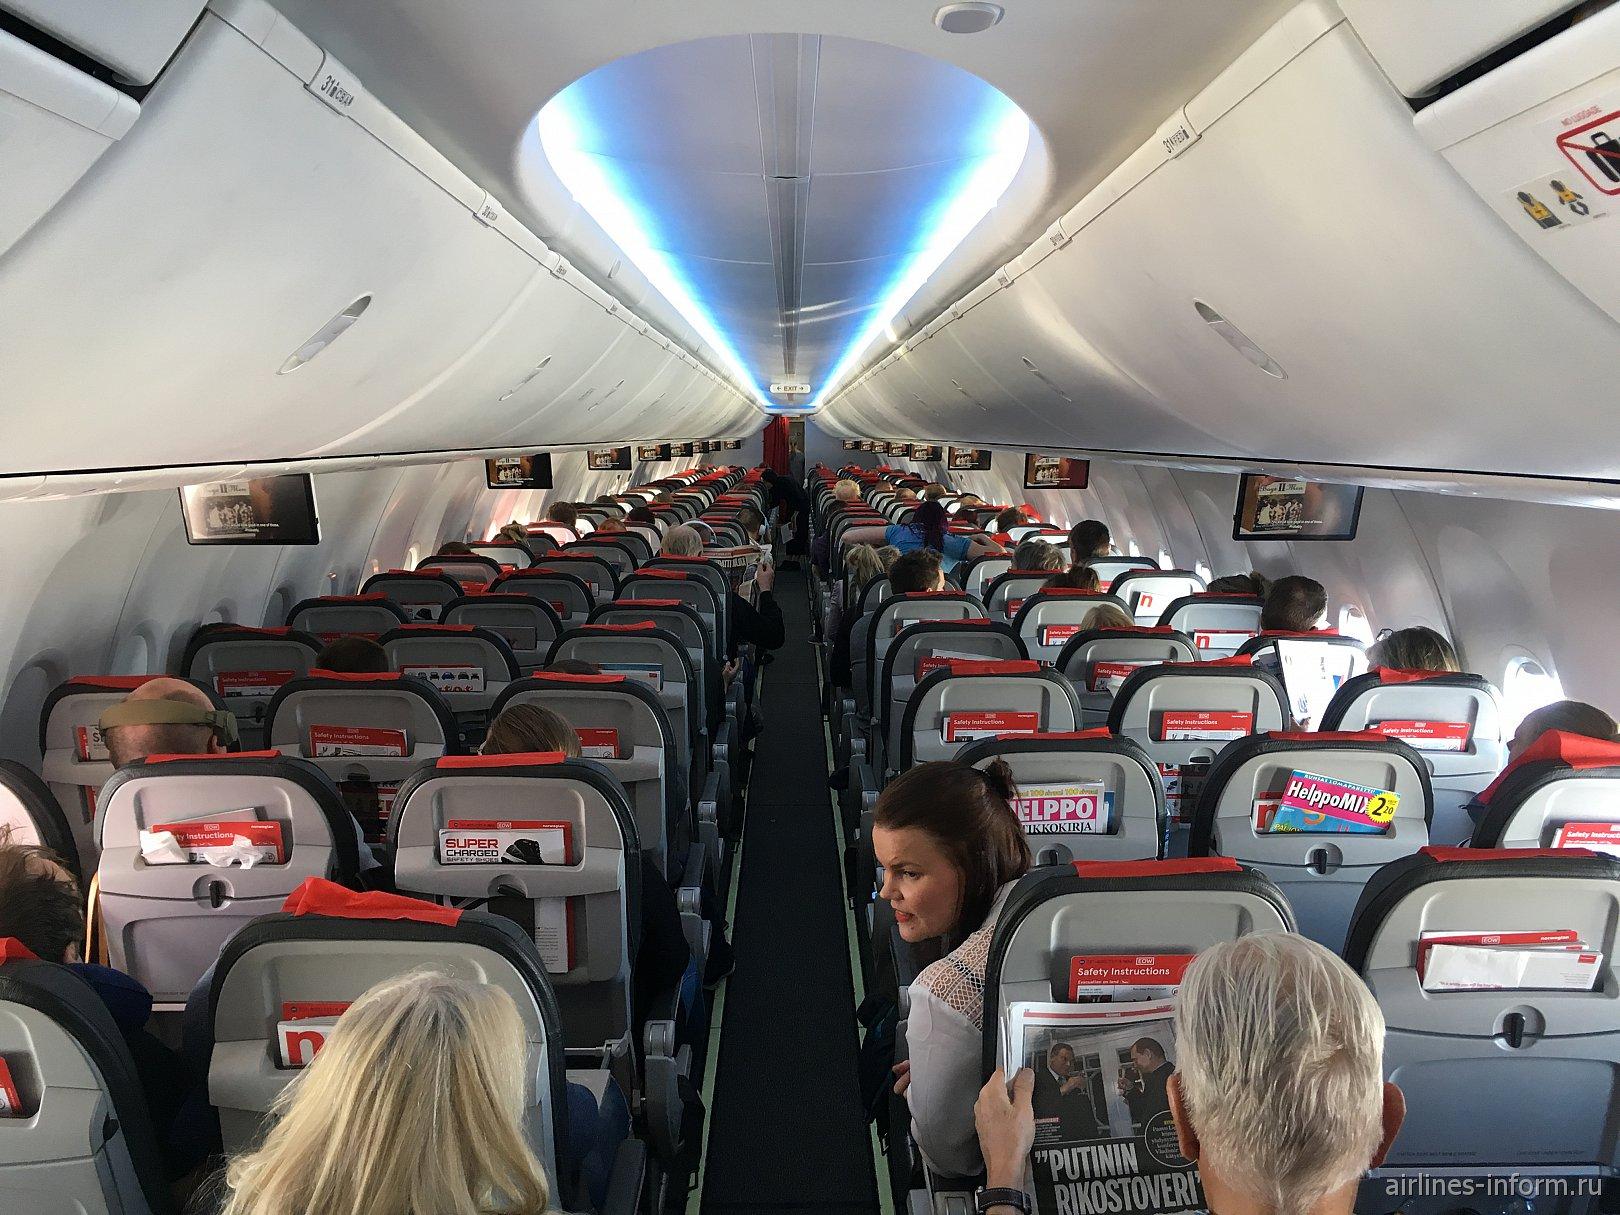 Пассажирский салон самолета Боинга-737 МАХ 8 авиакомпании Norwegian